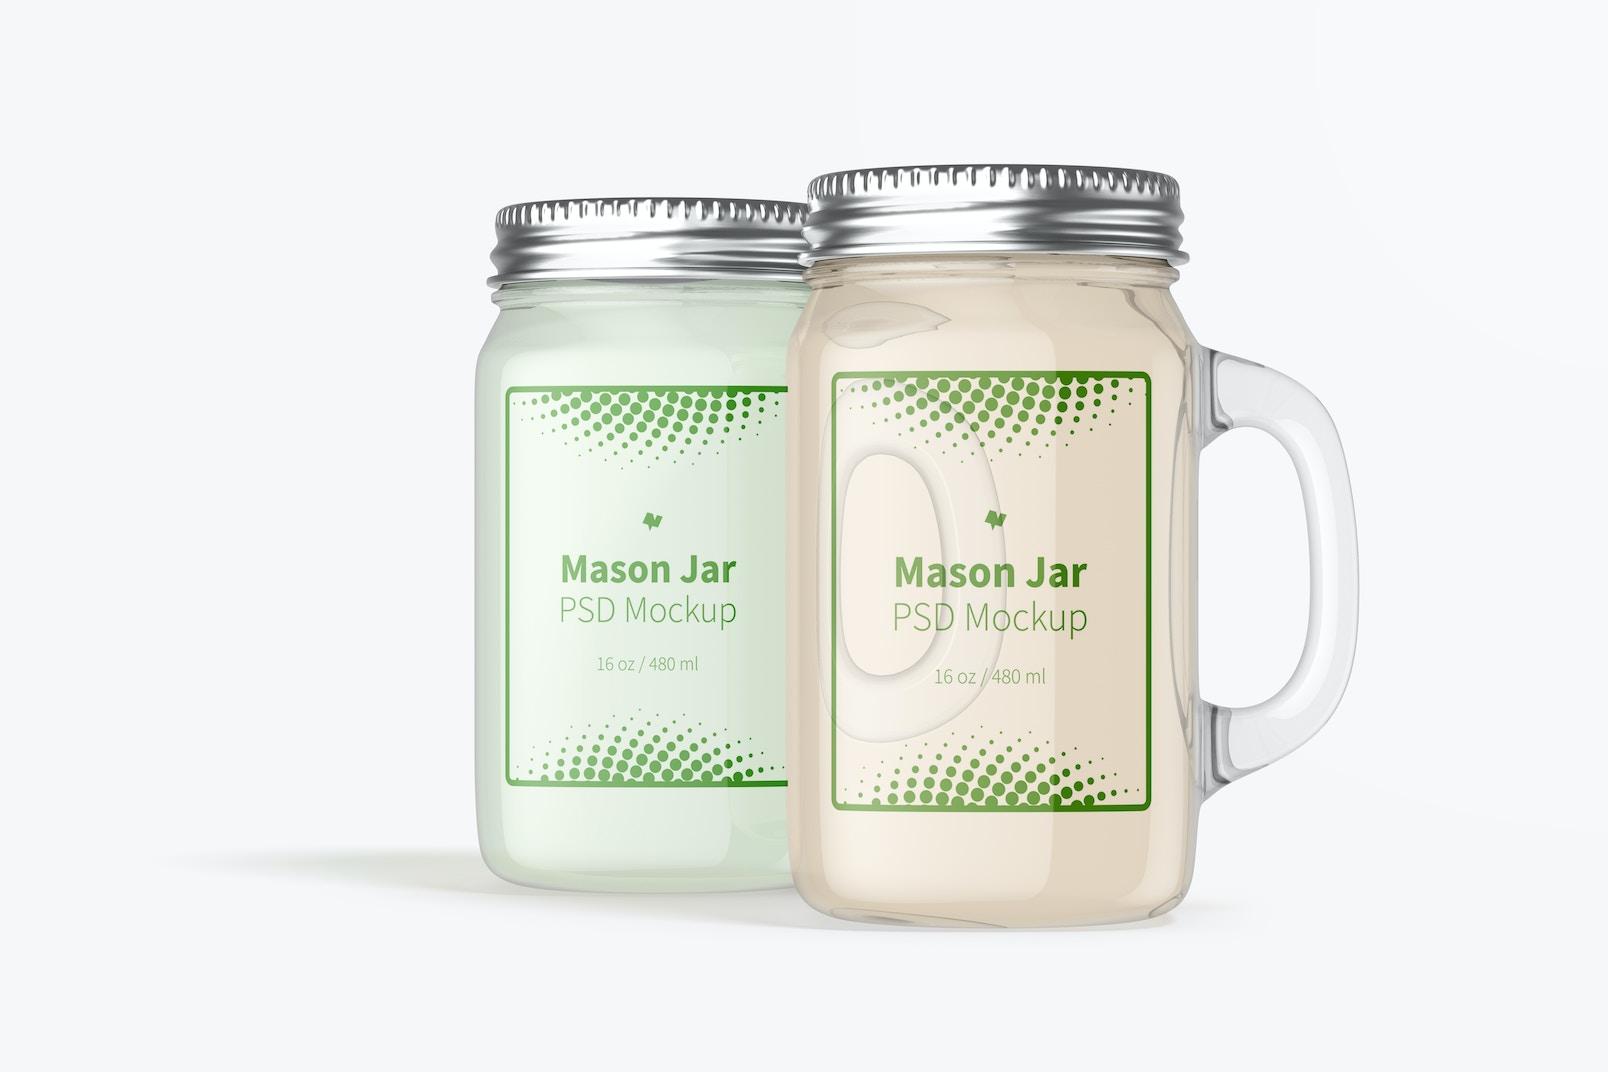 16 oz Mason Jars Mockup